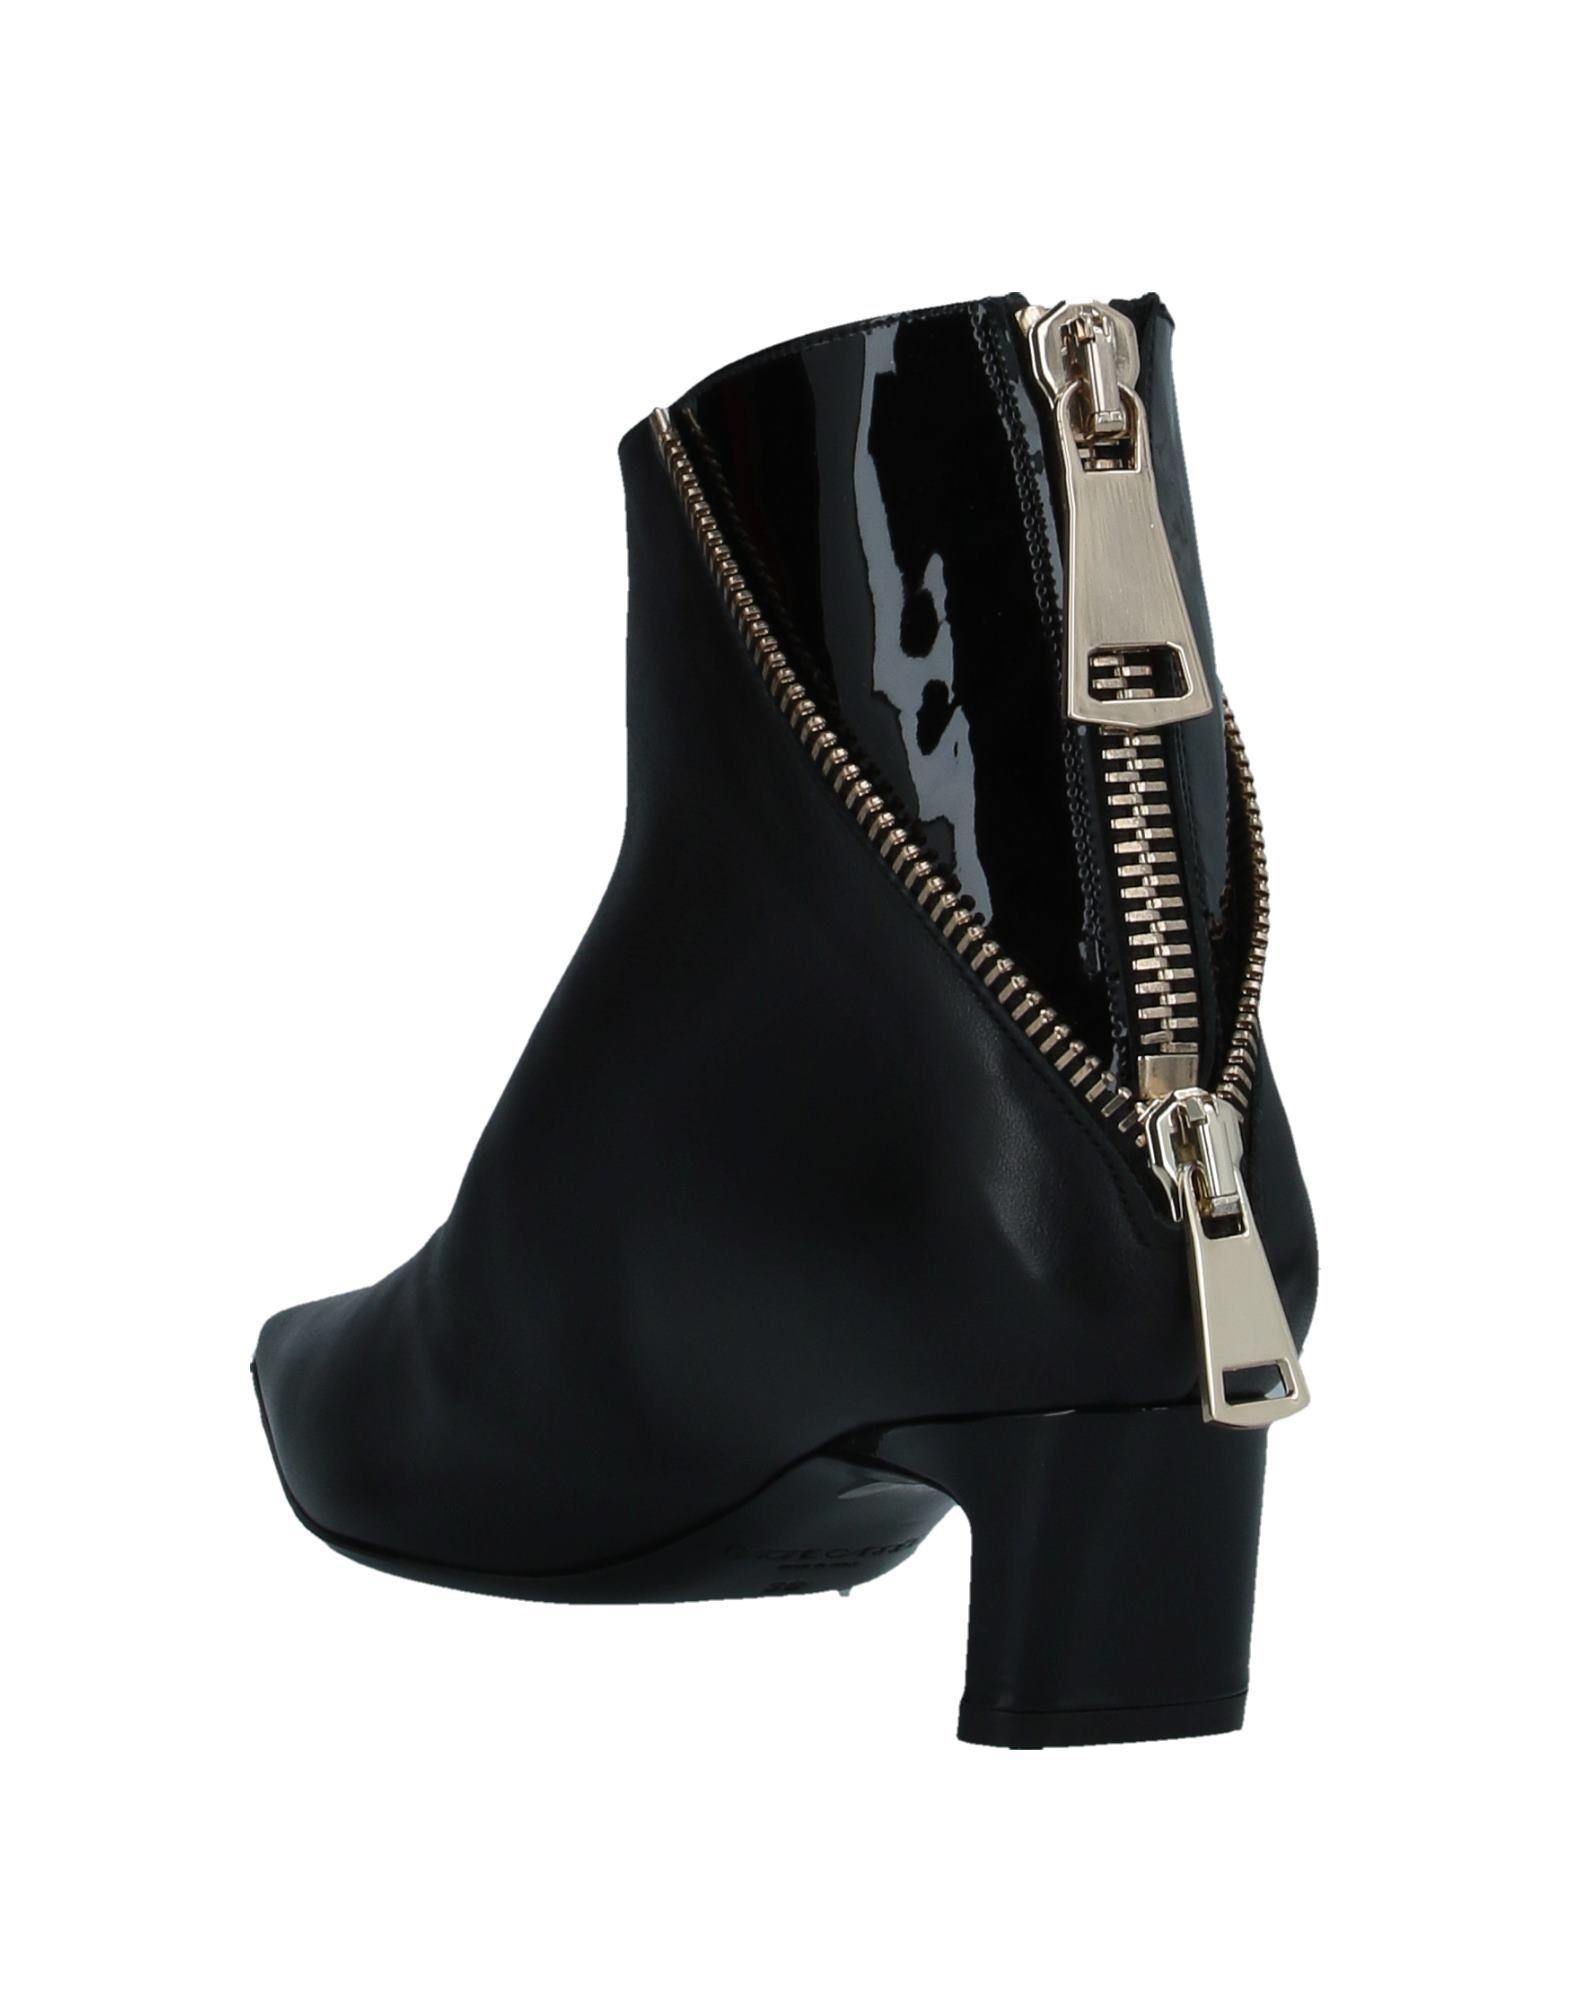 Racine Carrée Women's Ankle Boots Black Pelliccia Di Vitello